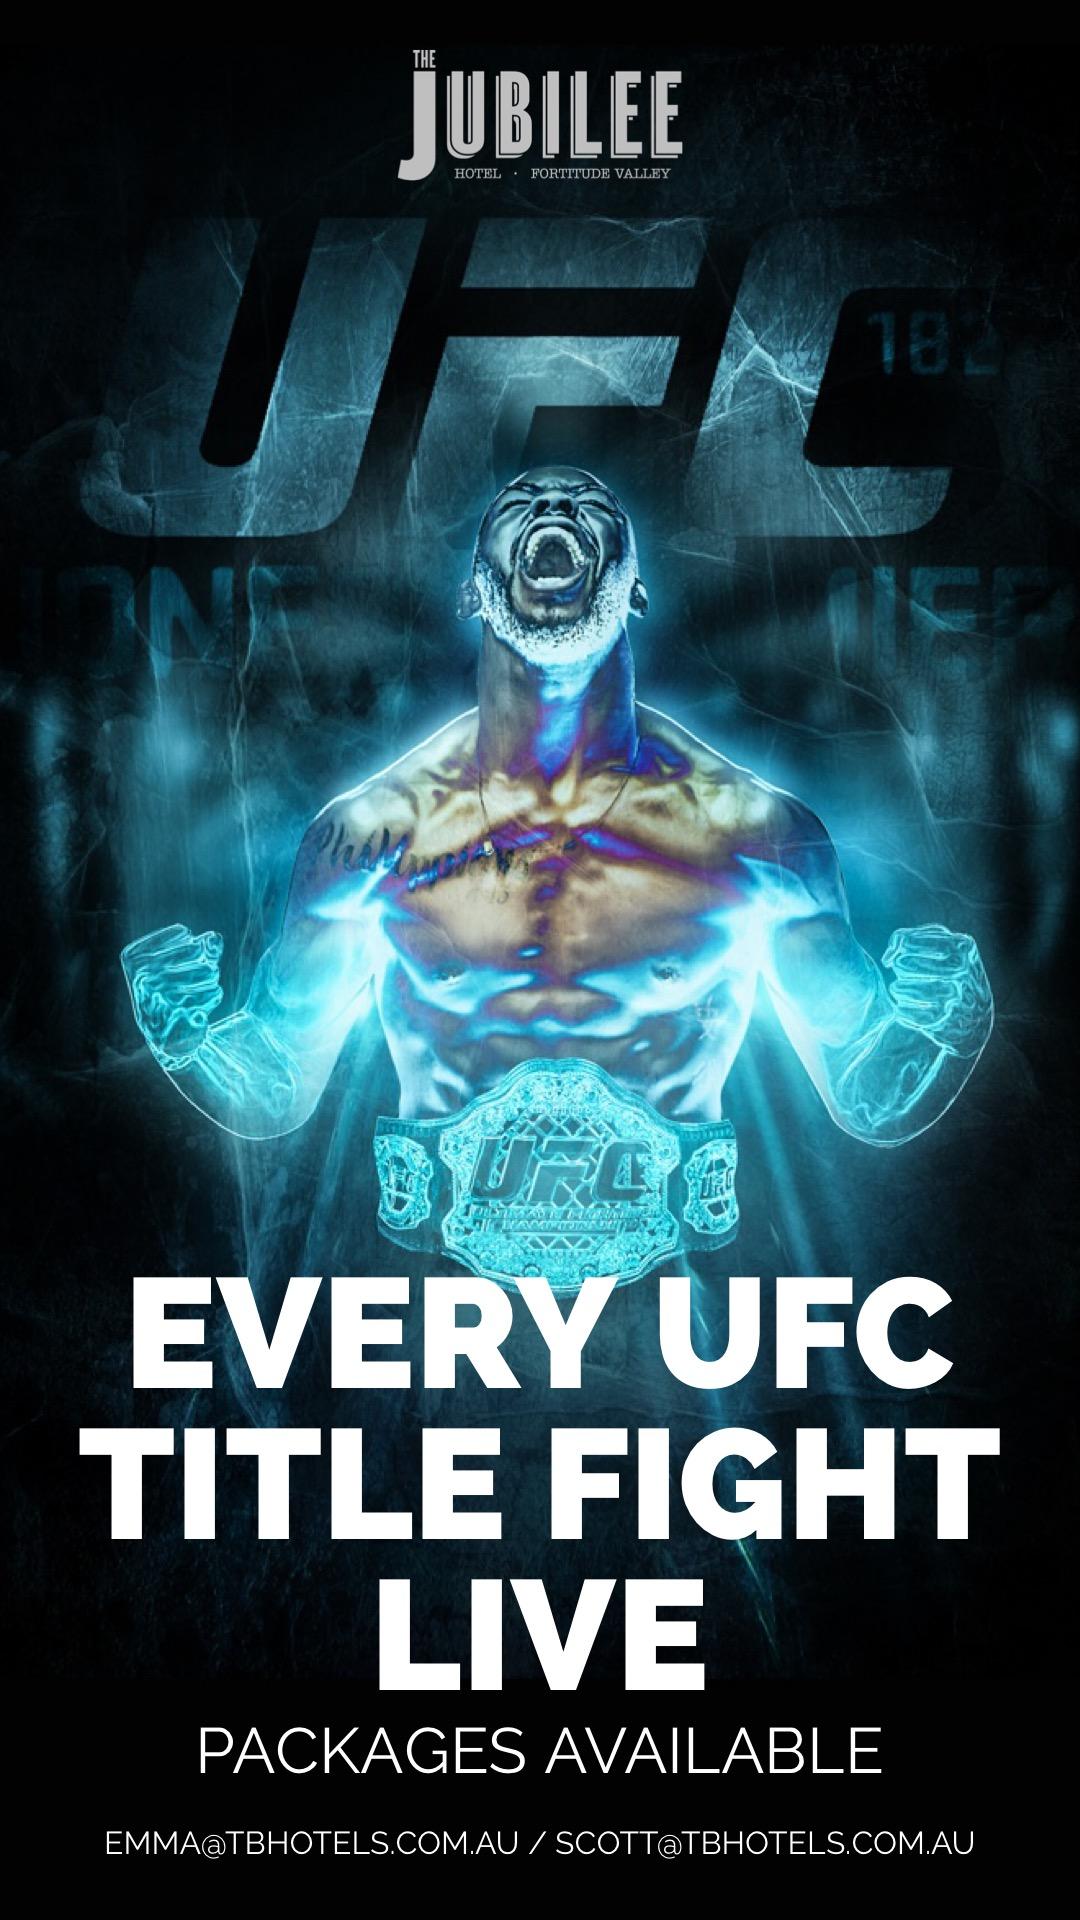 JUB UFC Insta Story